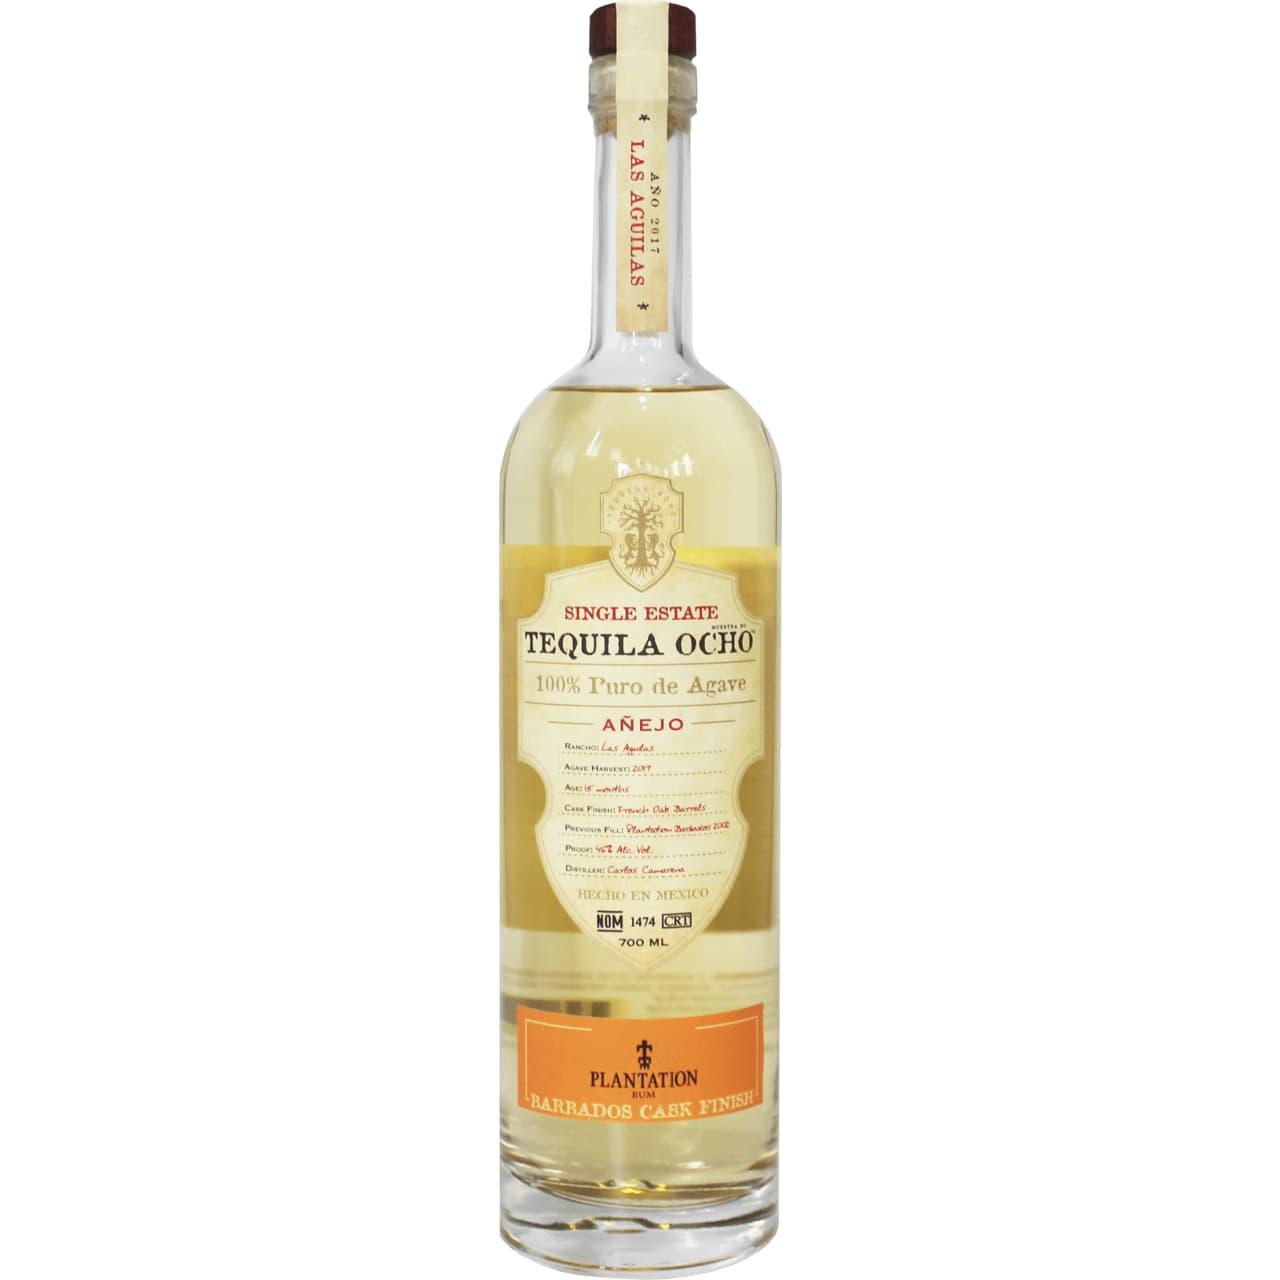 Product Image - Ocho Anejo 2017 - Barbados Rum Cask Finish